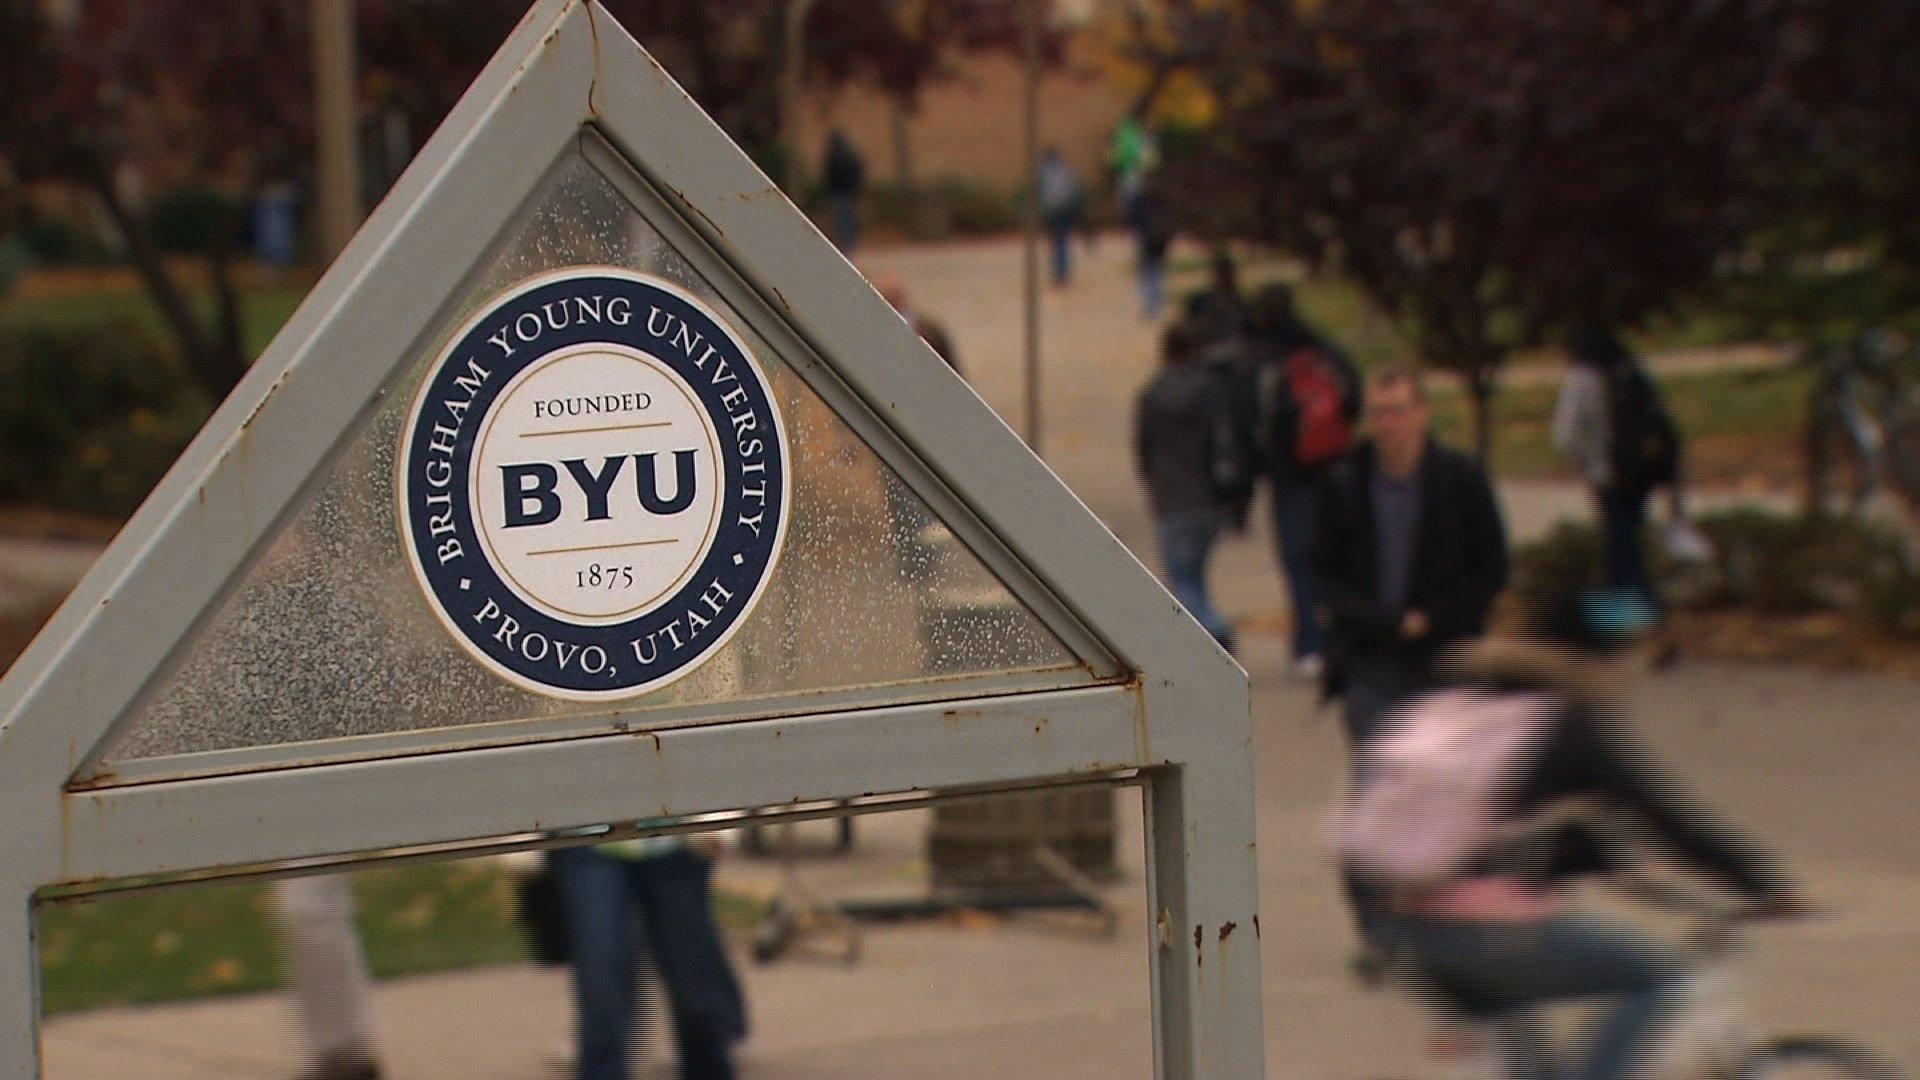 BYU, Brigham Young University generic sign90140026-159532